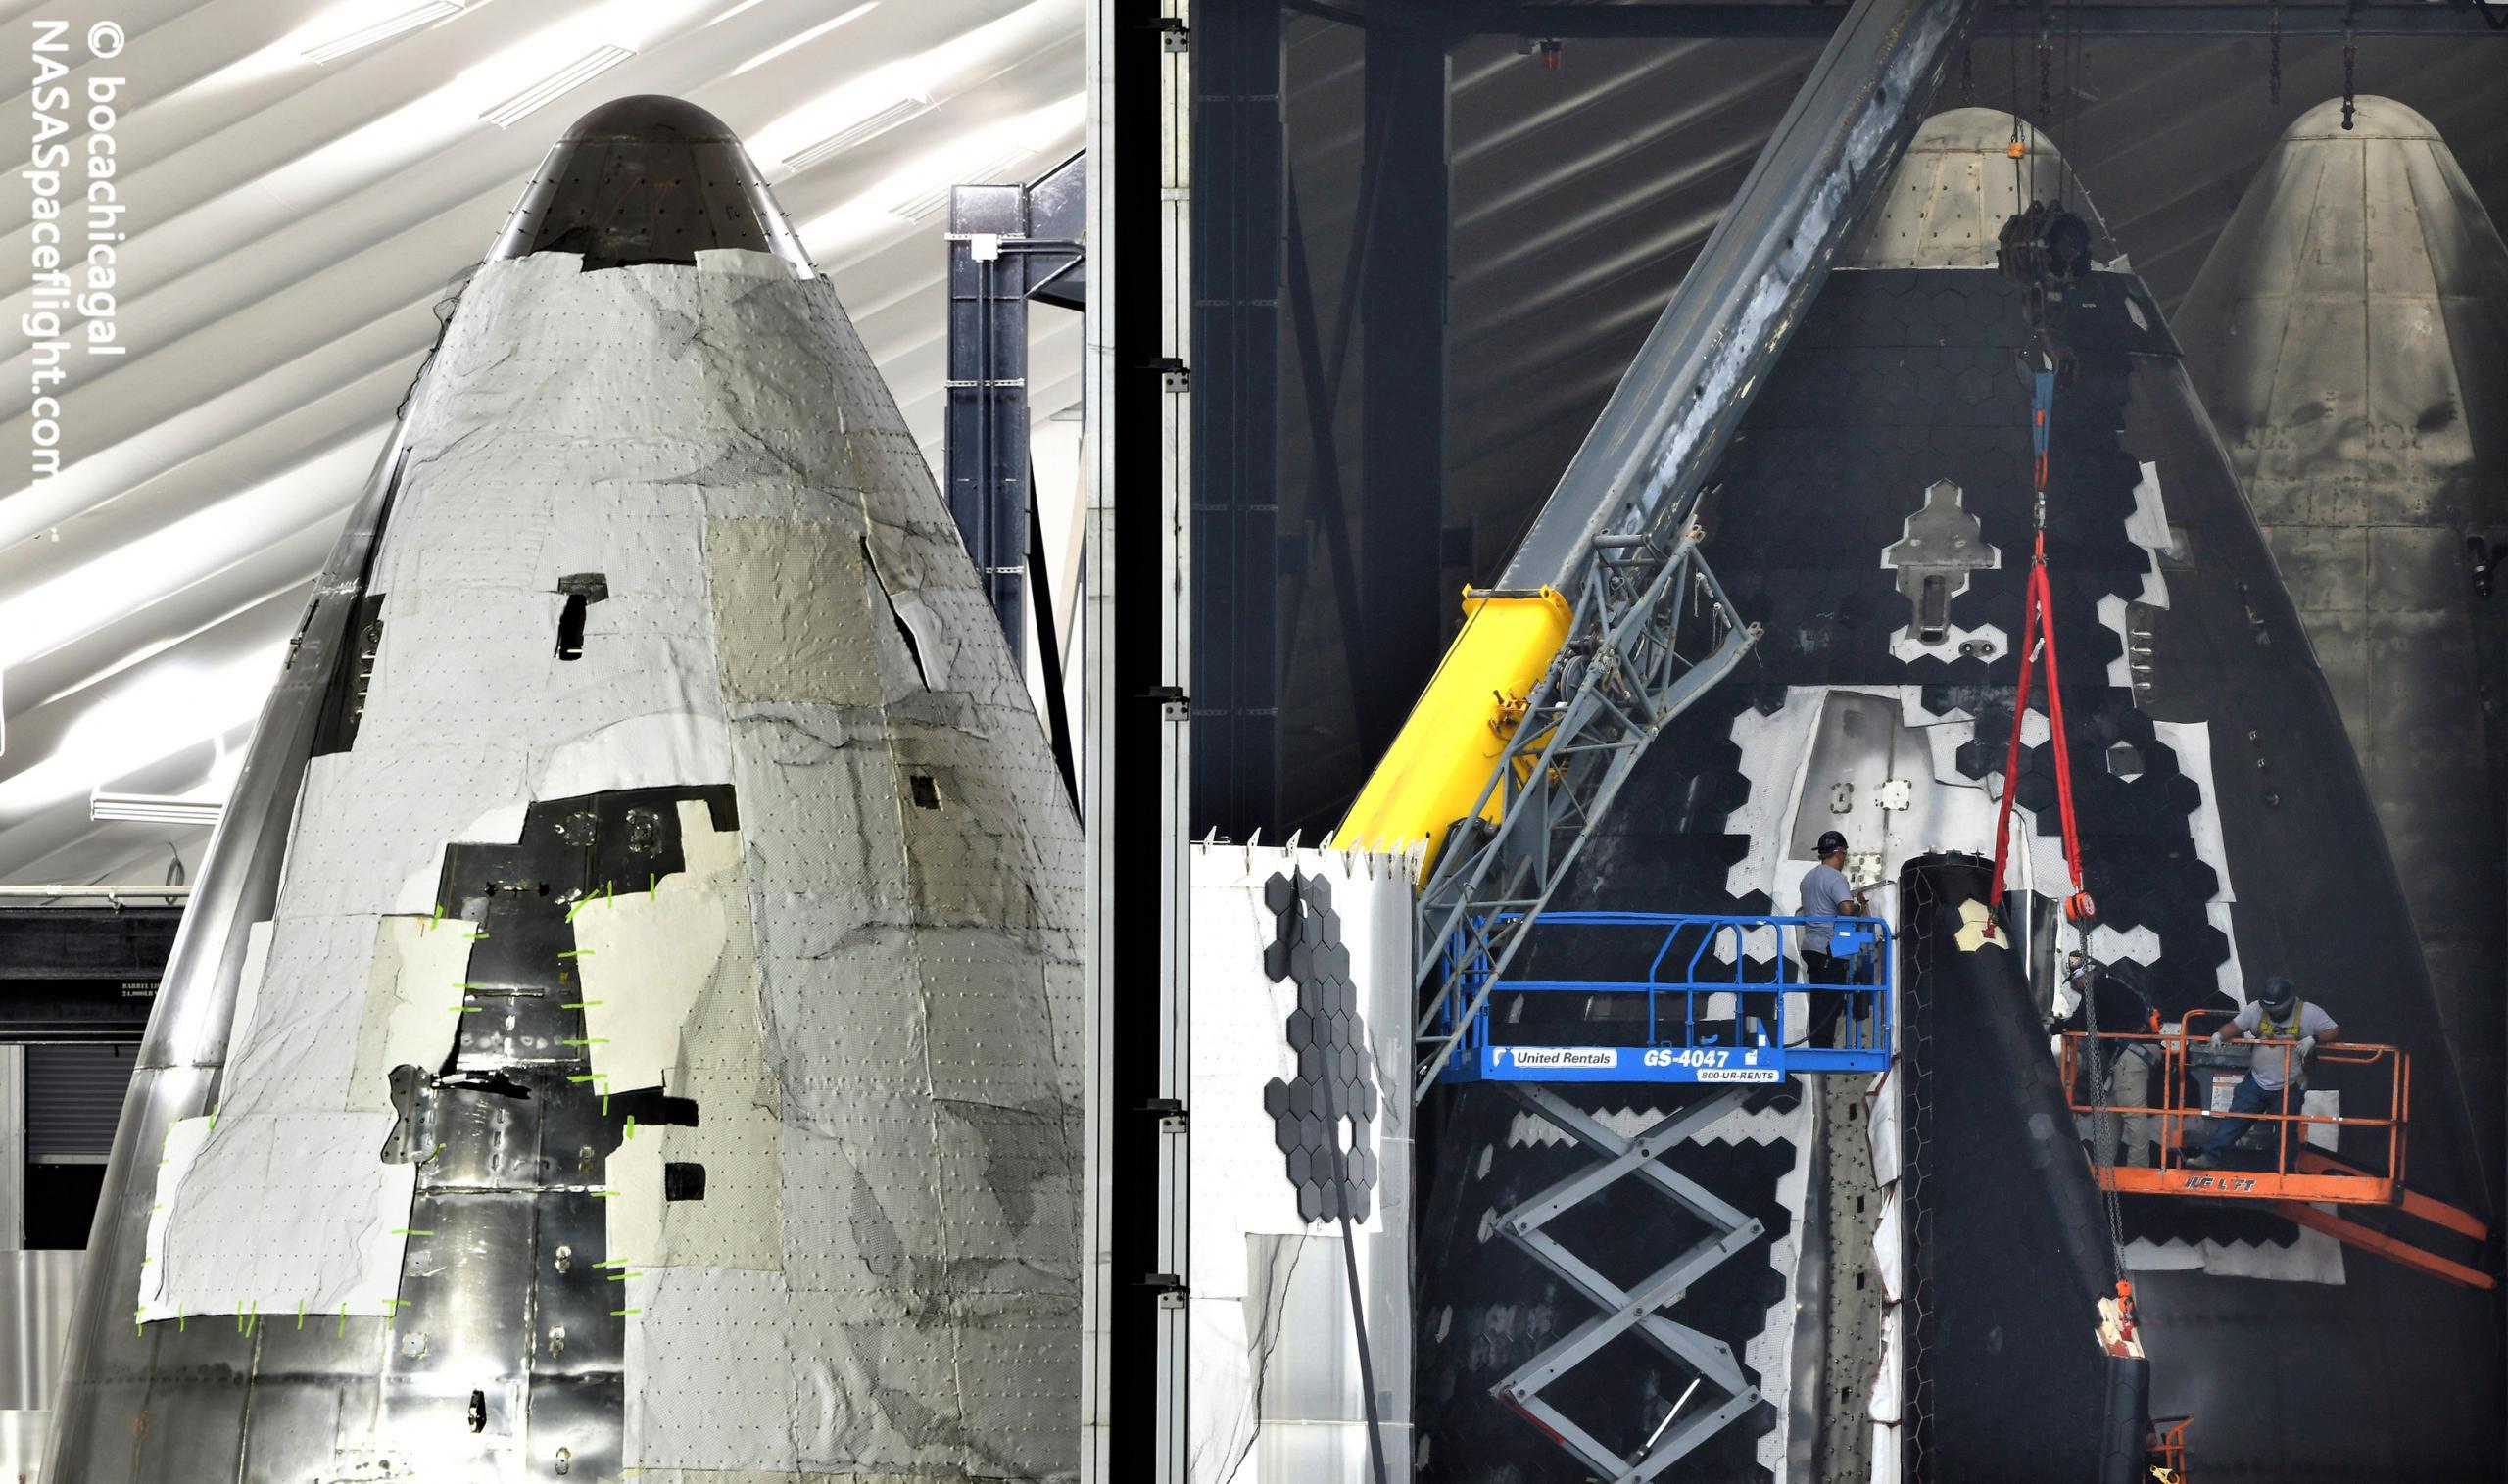 Starbase (NASASpaceflight – bocachicagal) S21 nose TPS work 0921 to 0930 1 (c)